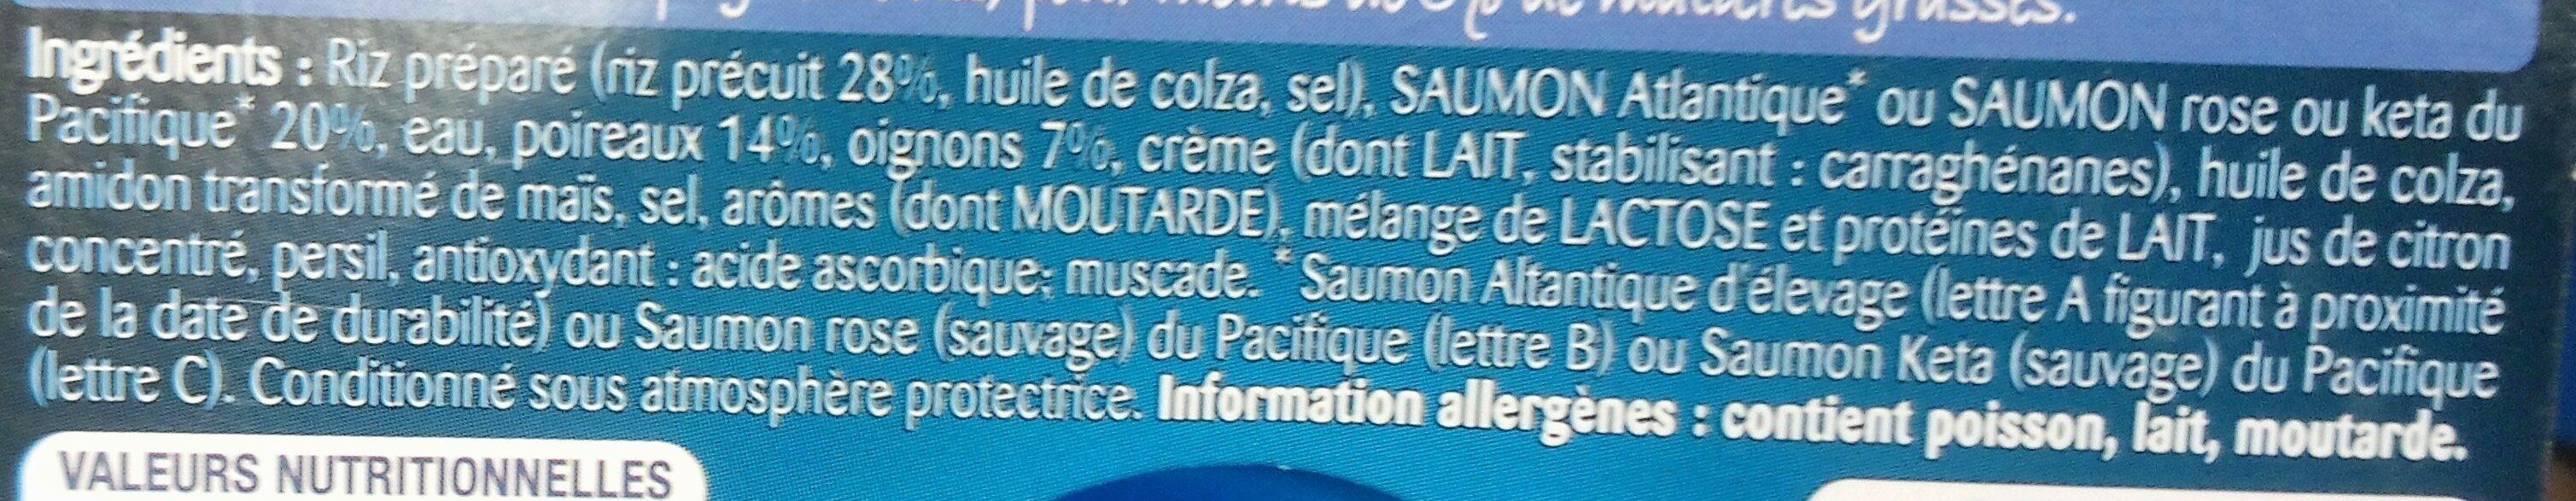 Saumon fondue de poireaux, Riz et oignons - Ingrediënten - fr